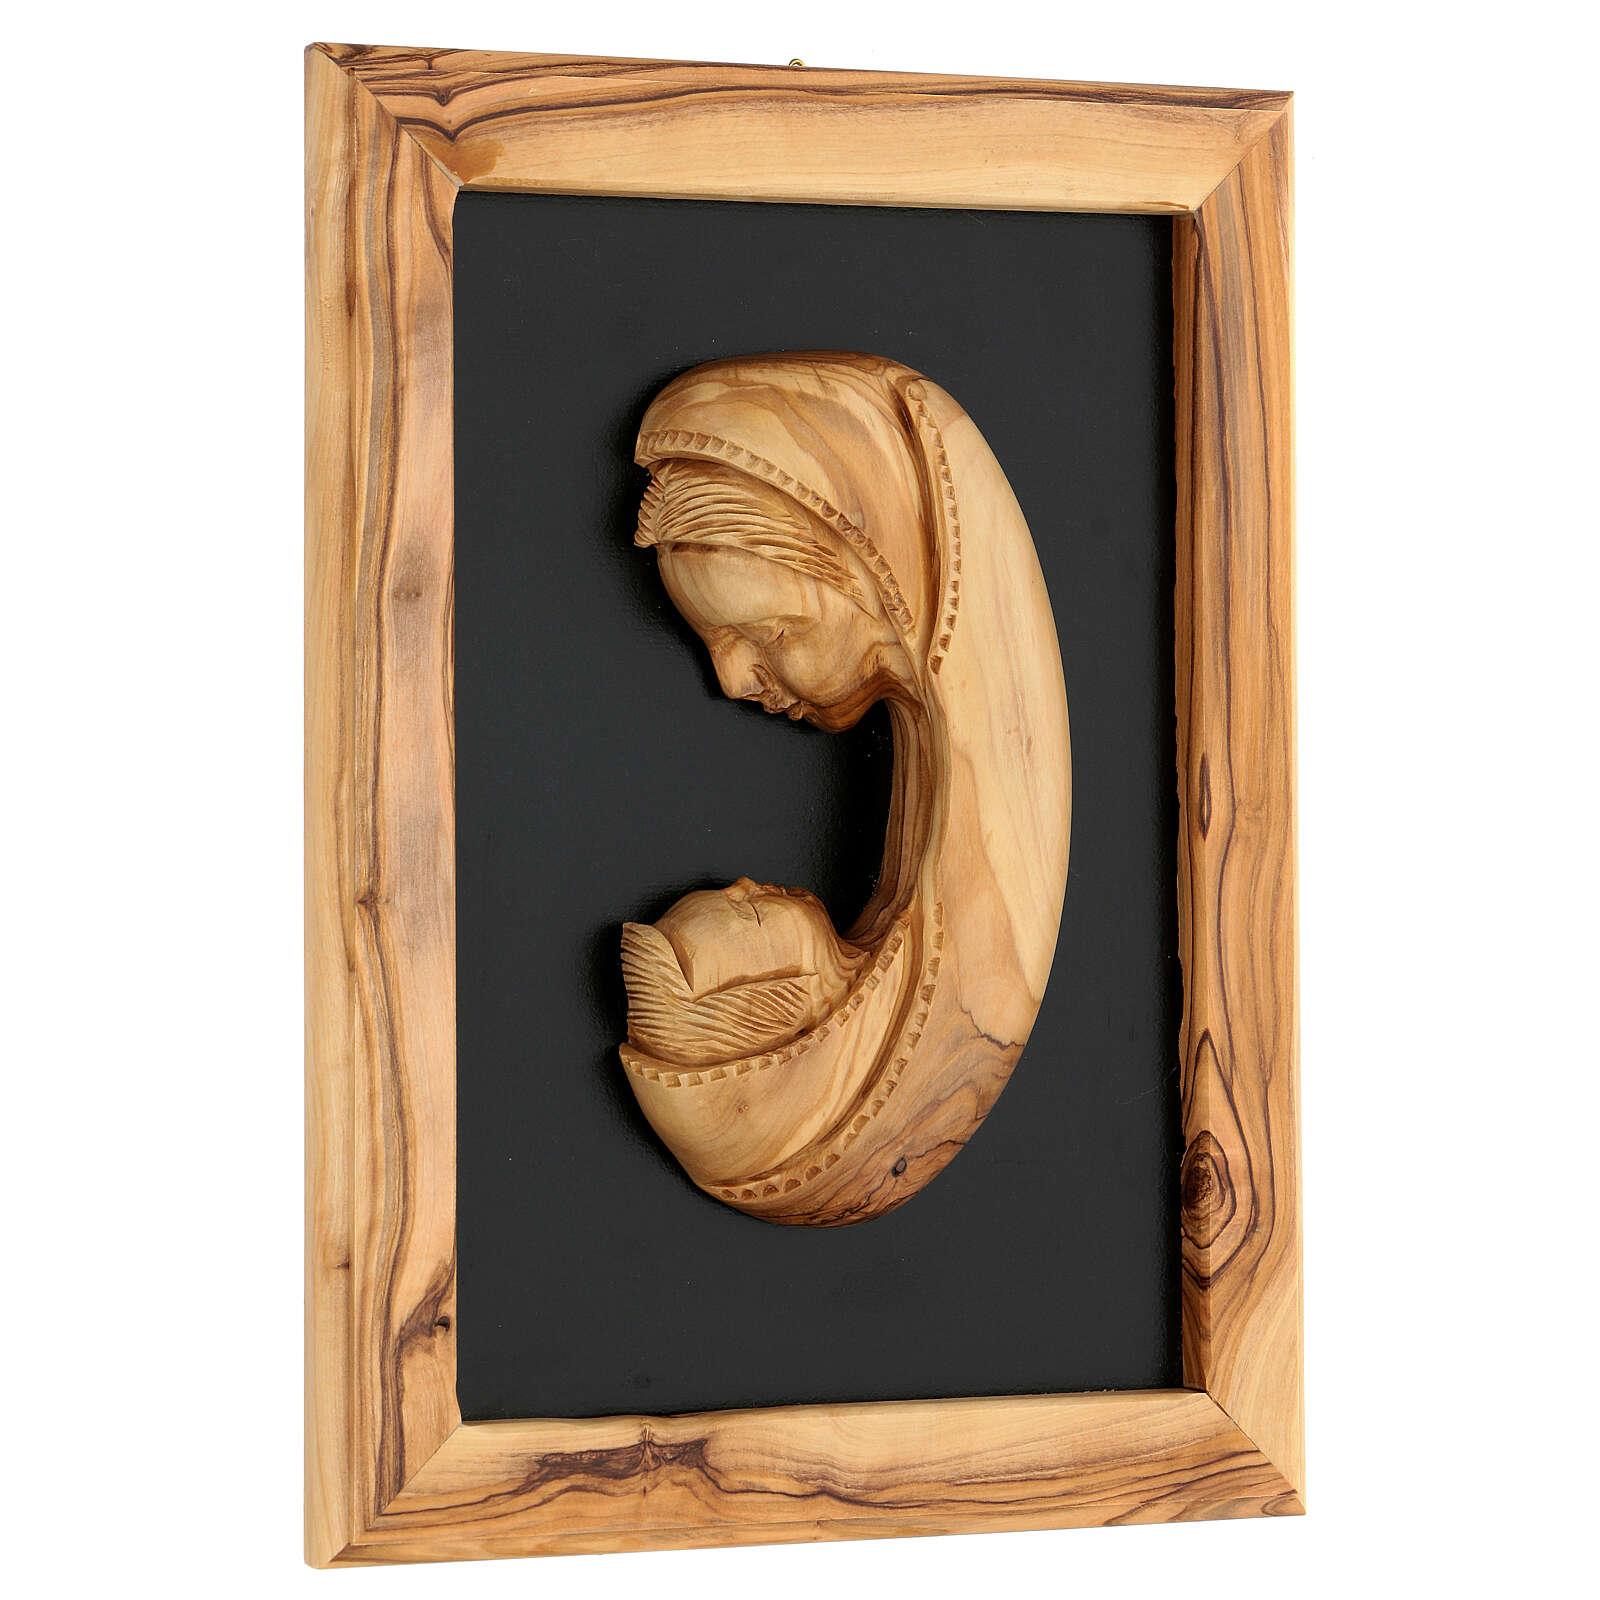 Marco María relieve madera olivo Belén 25x18 cm 3